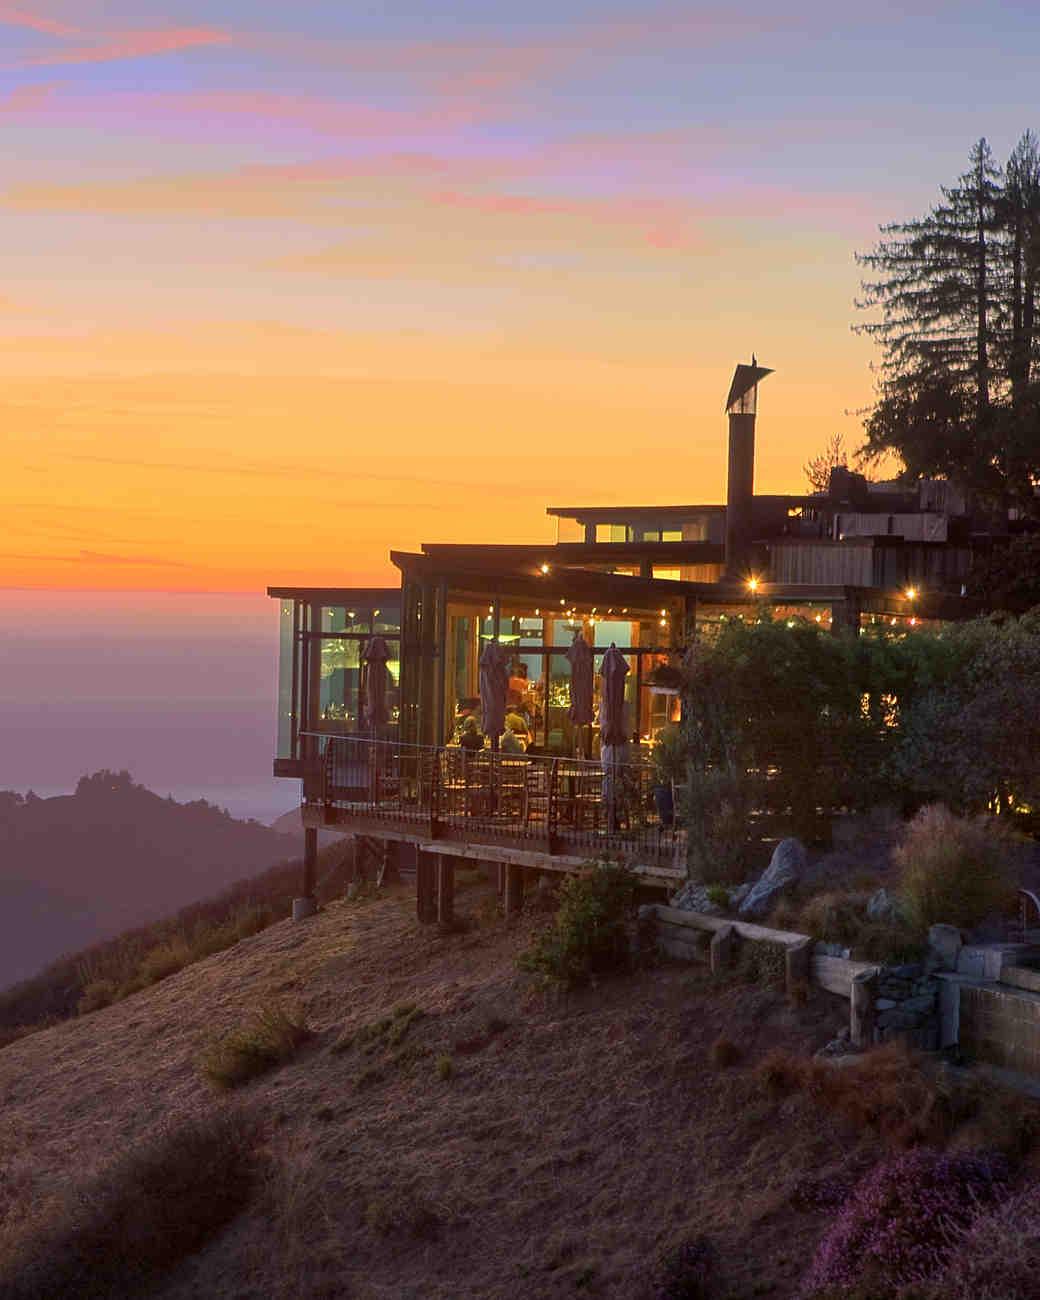 hotels for your honeymoon with amazing views | martha stewart weddings